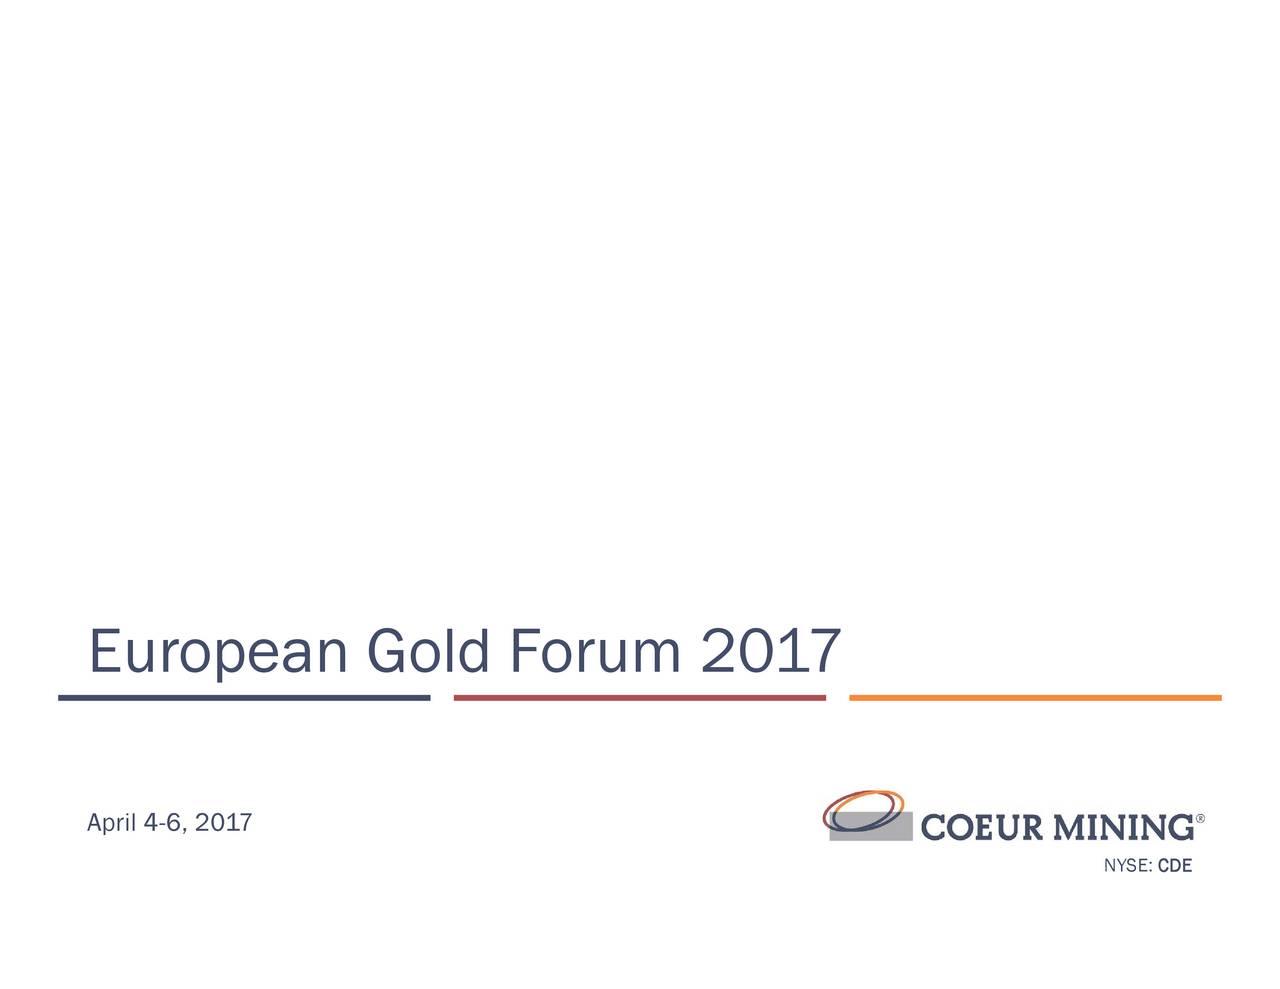 Coeur Mining (CDE) Presents At European Gold Forum 2017